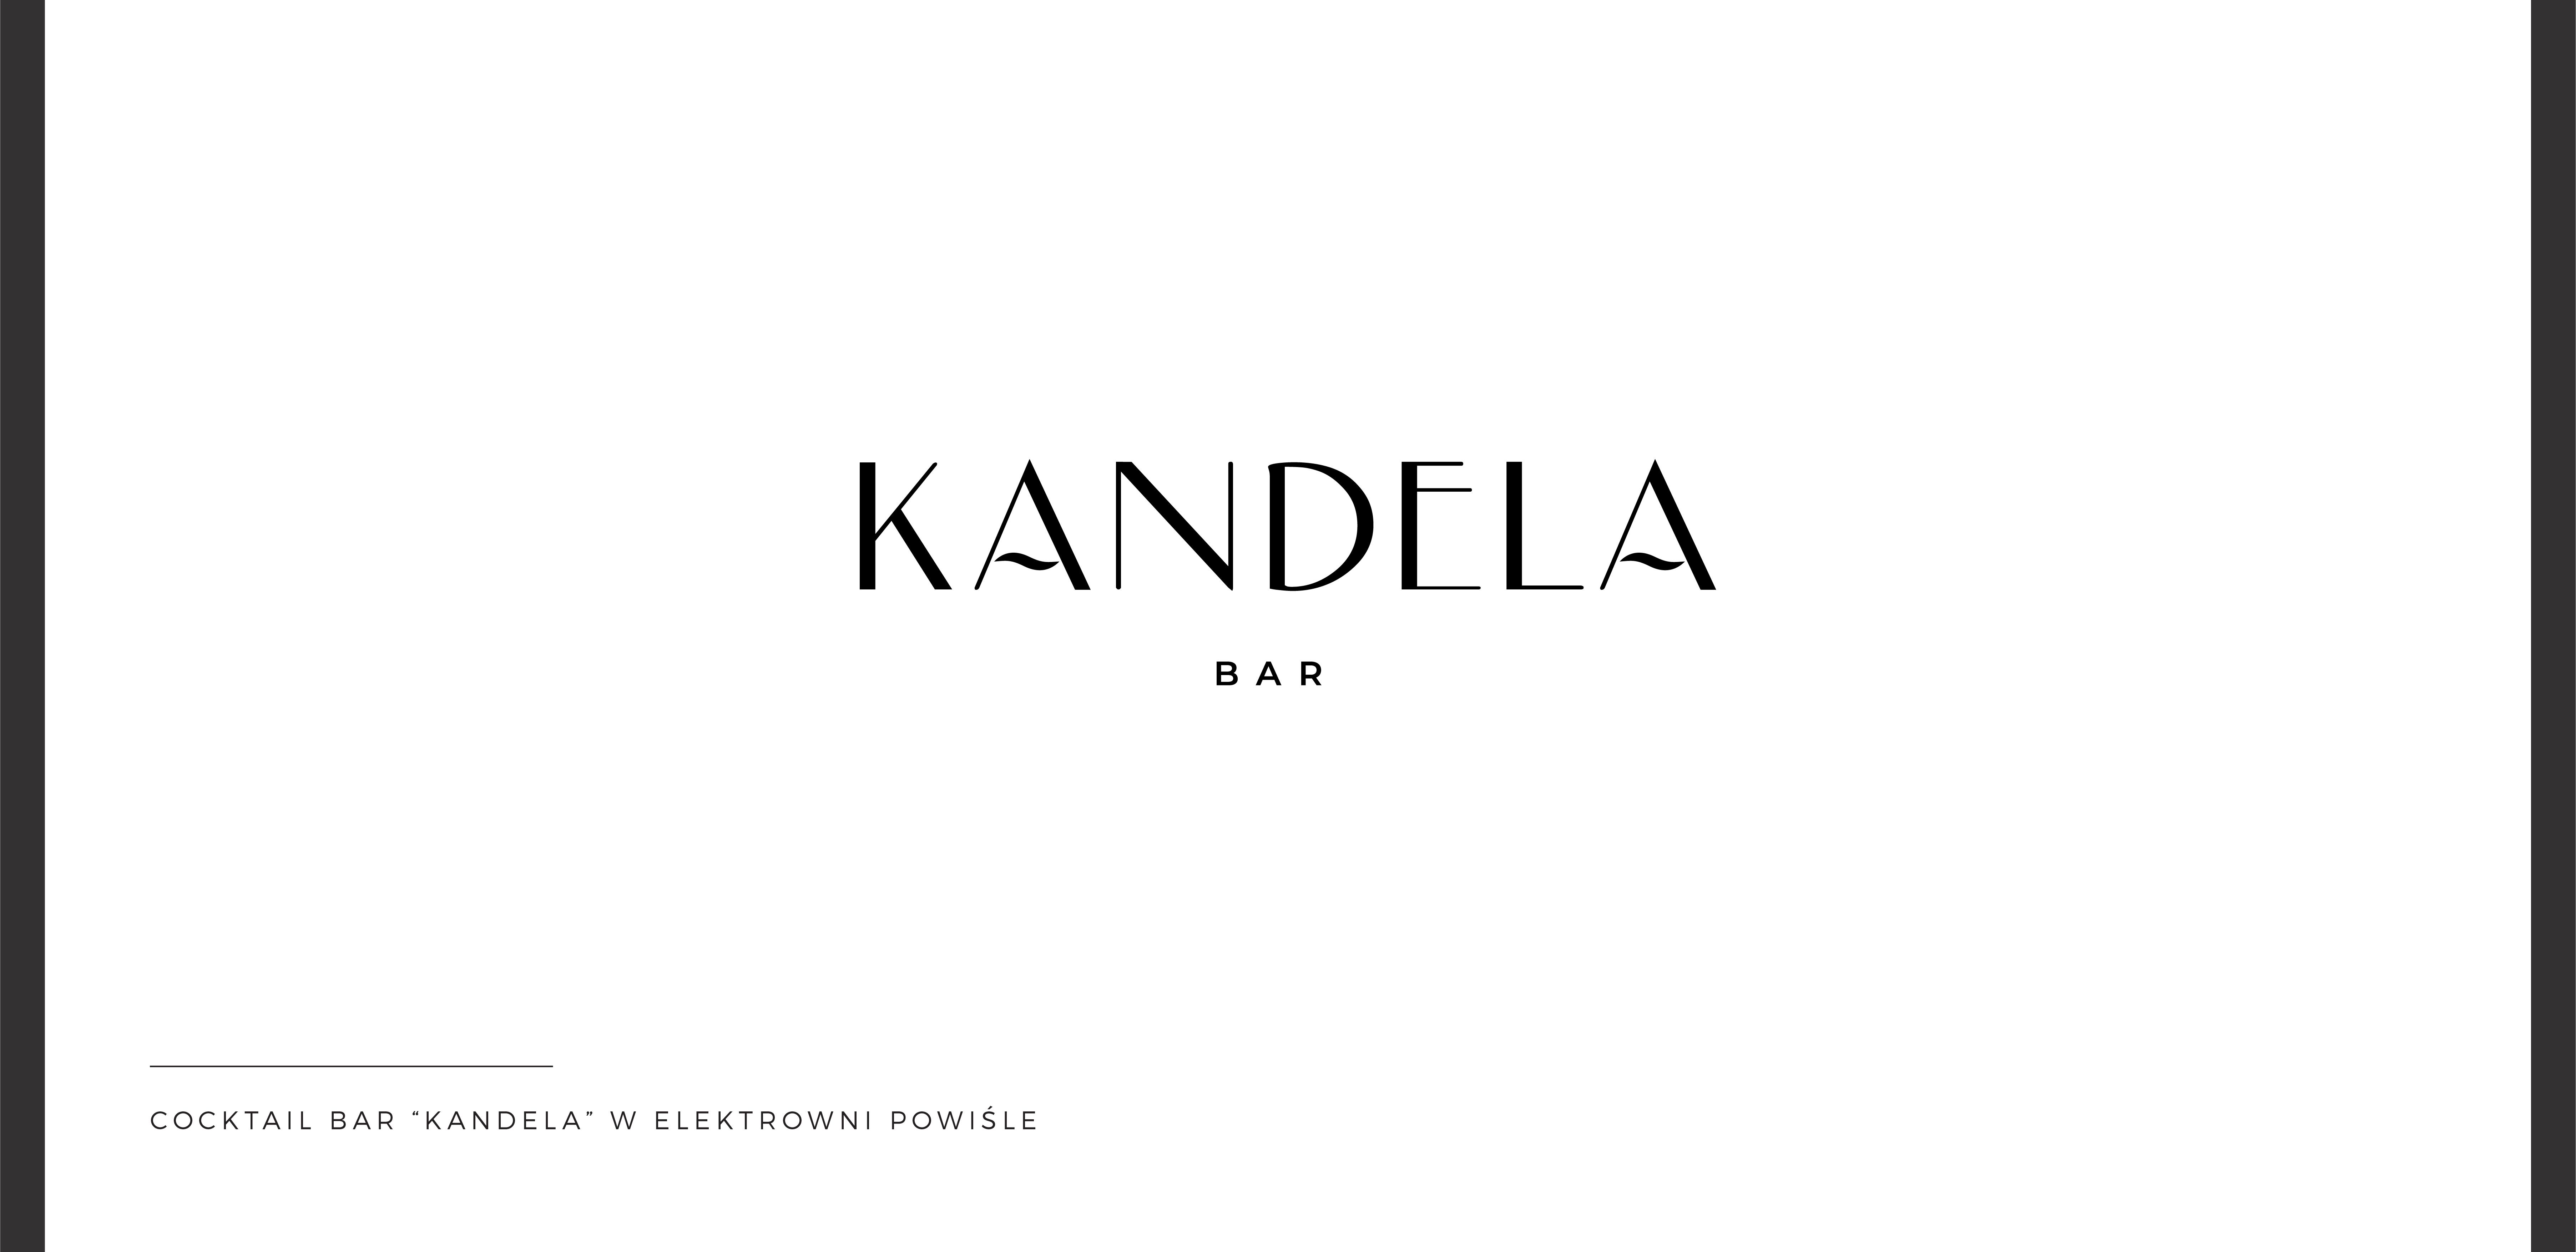 Kandela bar logo blink elektrownia powiśle